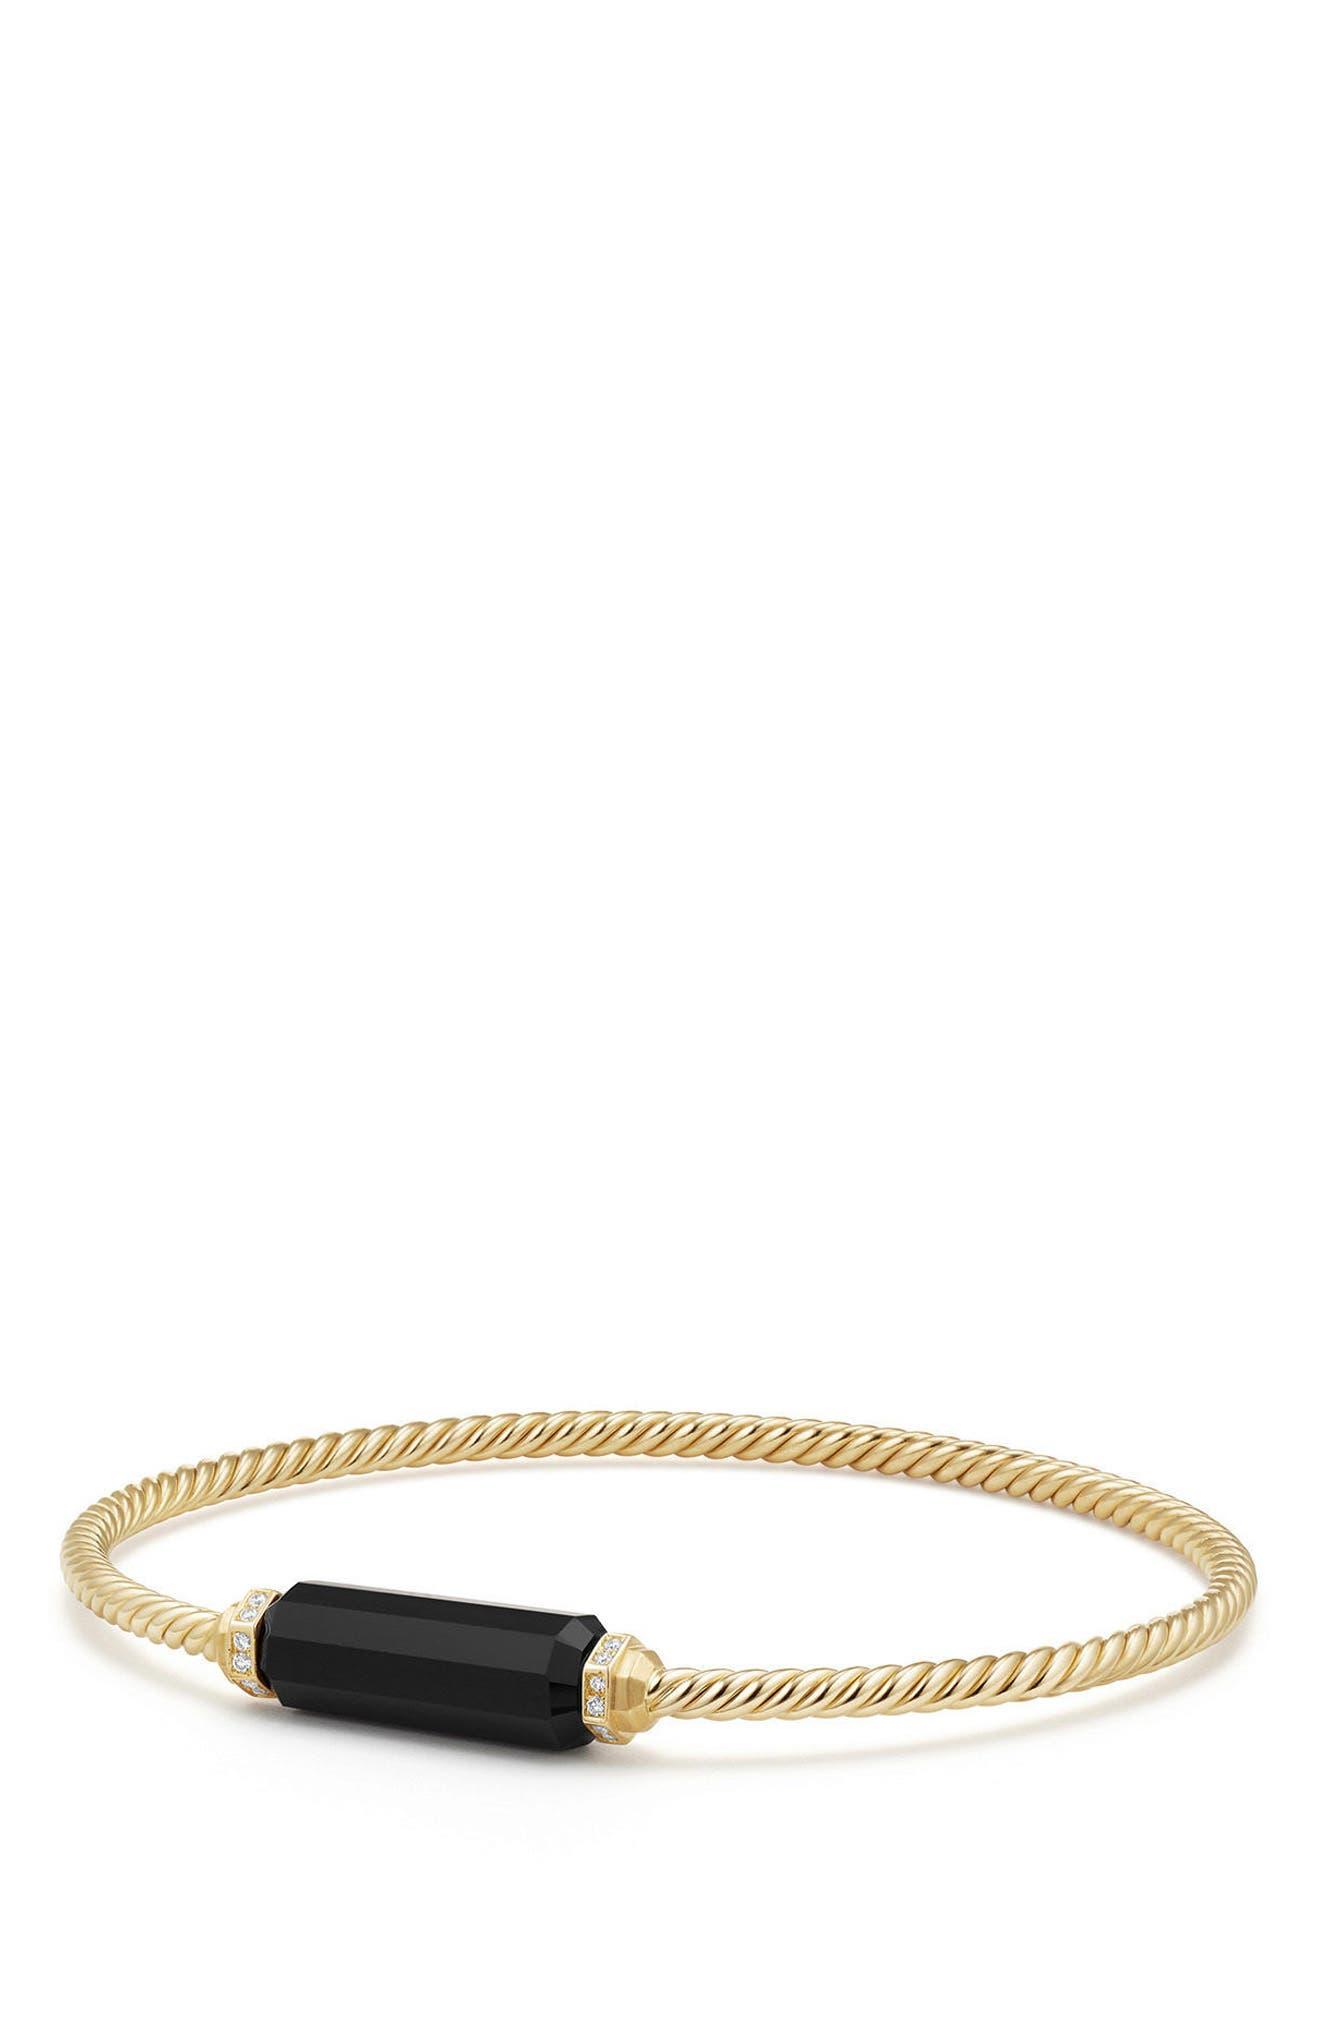 Barrels Bracelet with Diamonds in 18K Gold,                             Main thumbnail 1, color,                             BLACK ONYX